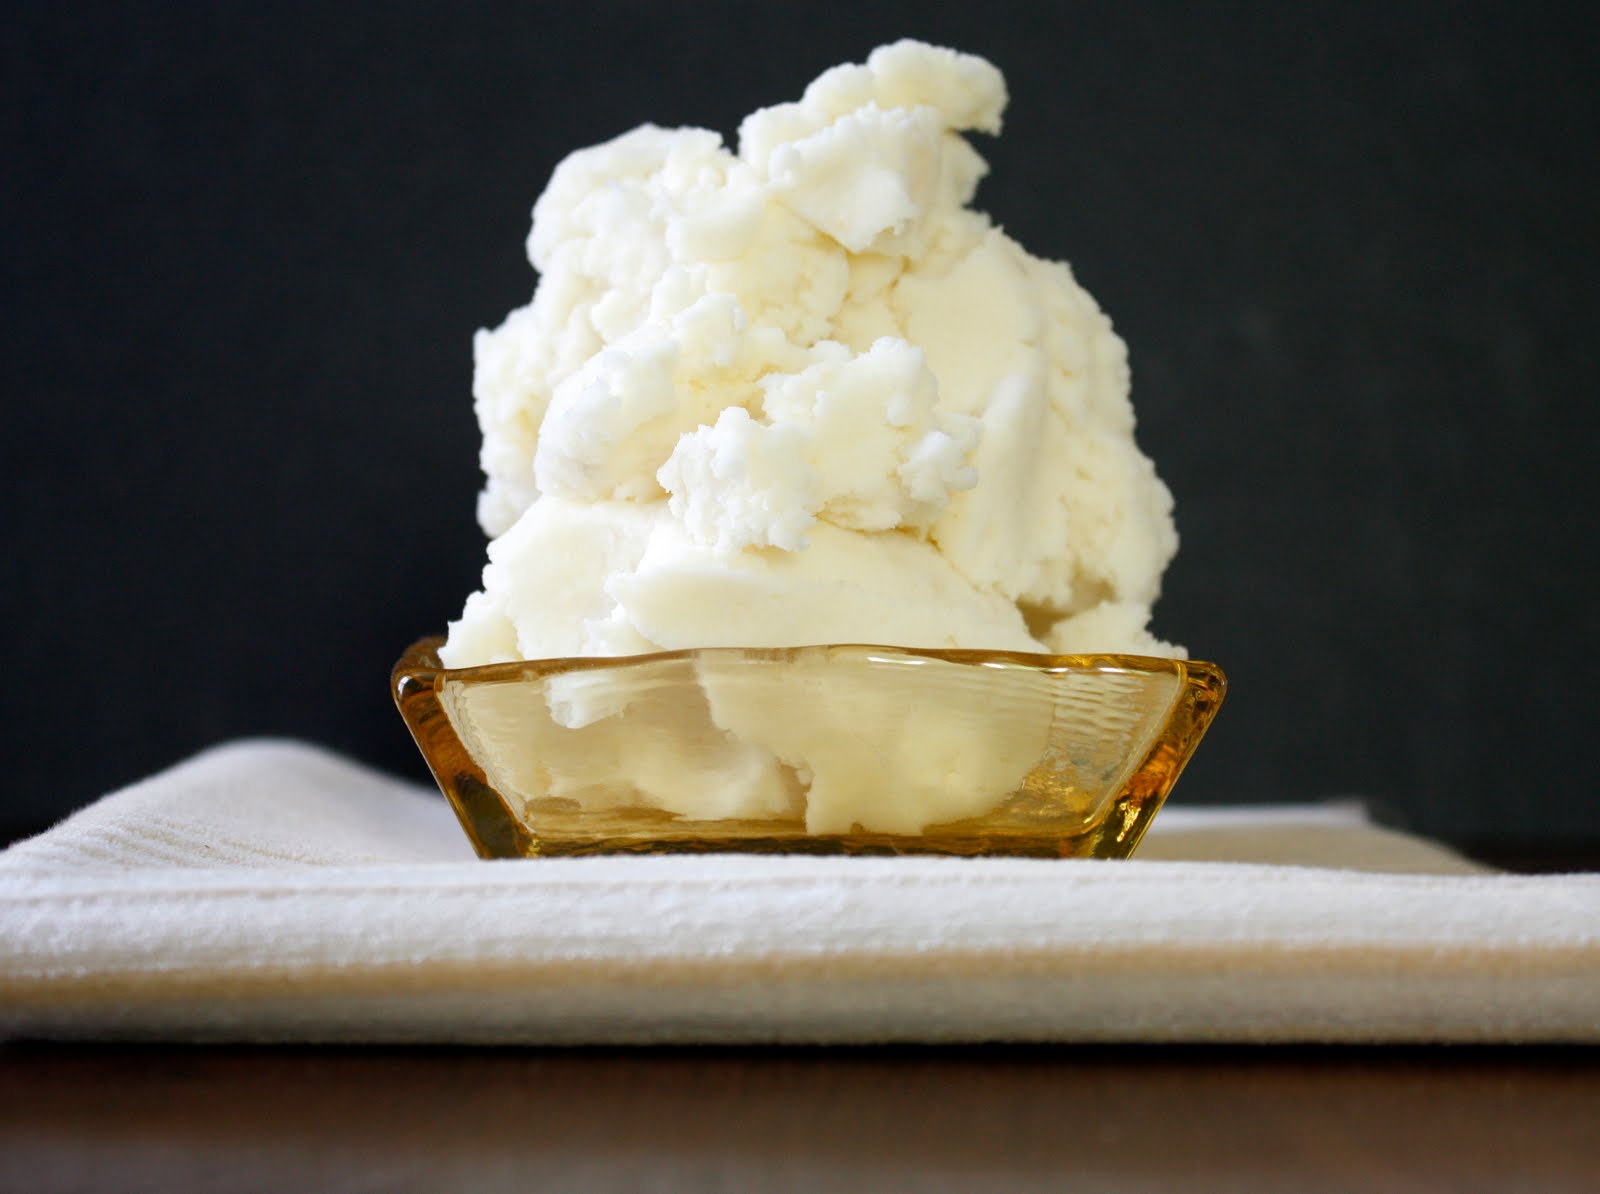 Crafty Lass: Make-Ahead Mashed Potatoes